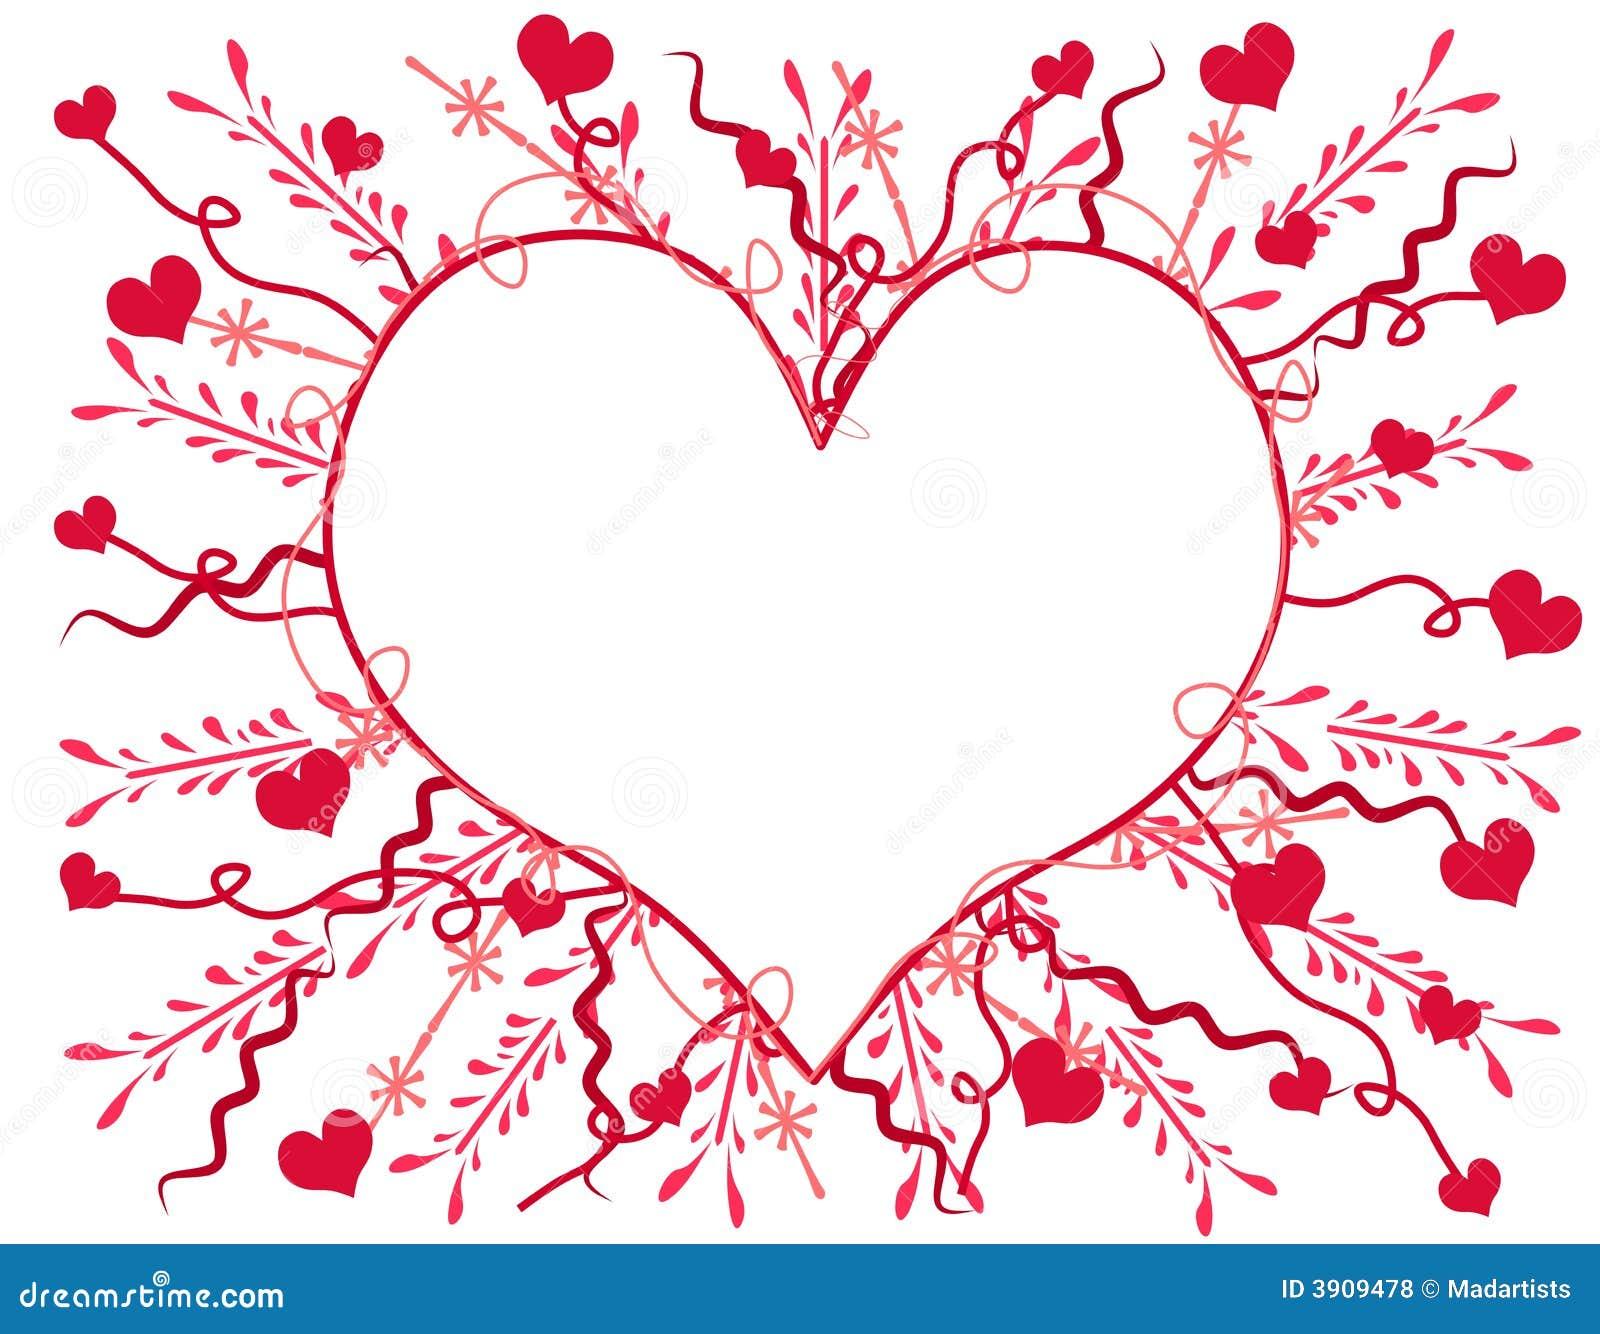 Artsy Valentines Day Heart Card 2 Royalty Free Photos – Valentine Heart Card